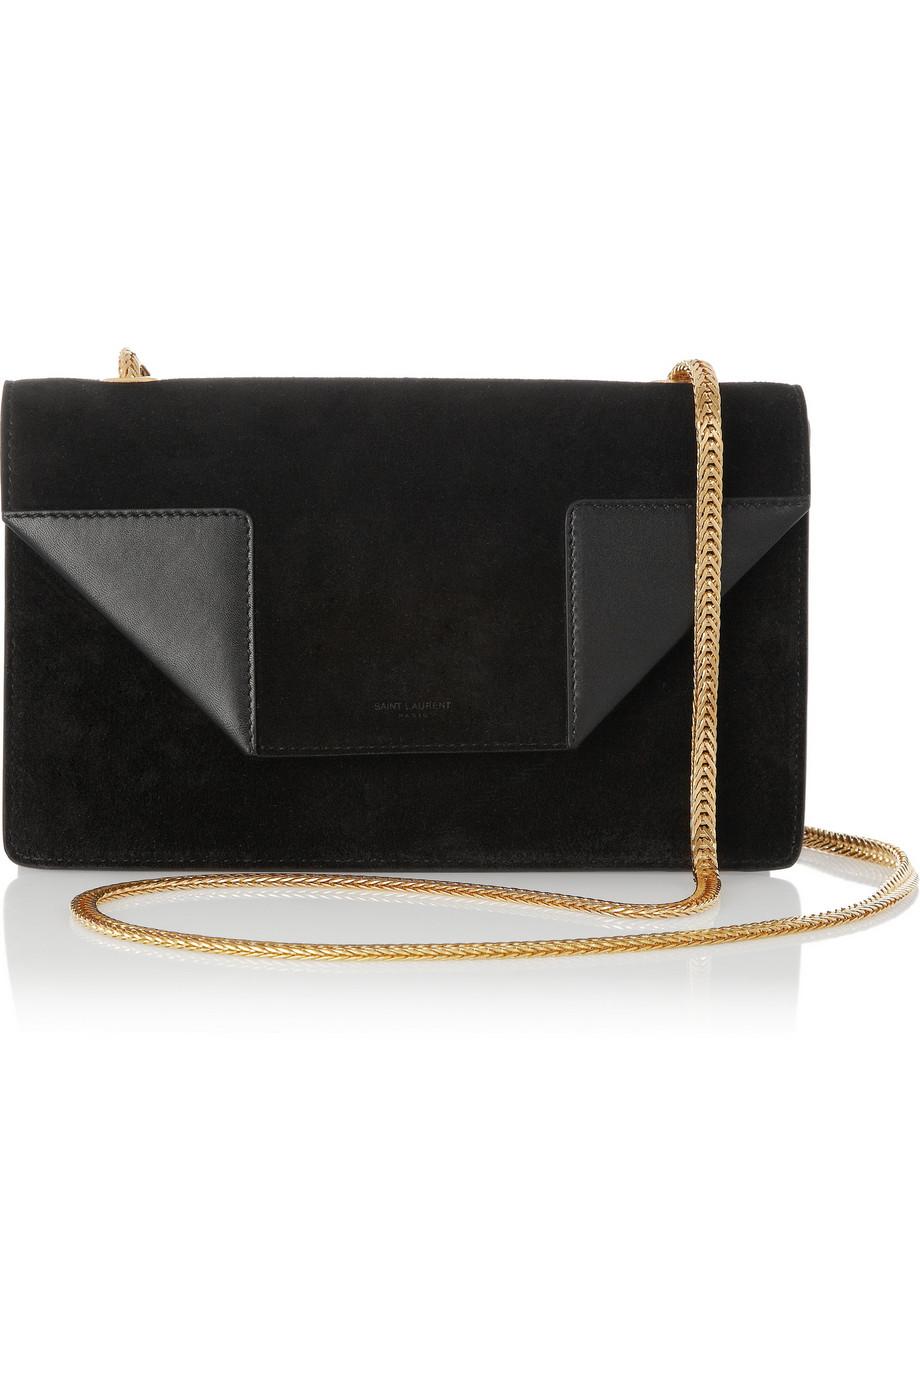 ysl red patent wallet - yves saint laurent betty shoulder bag, yves saint laurent clutch gold